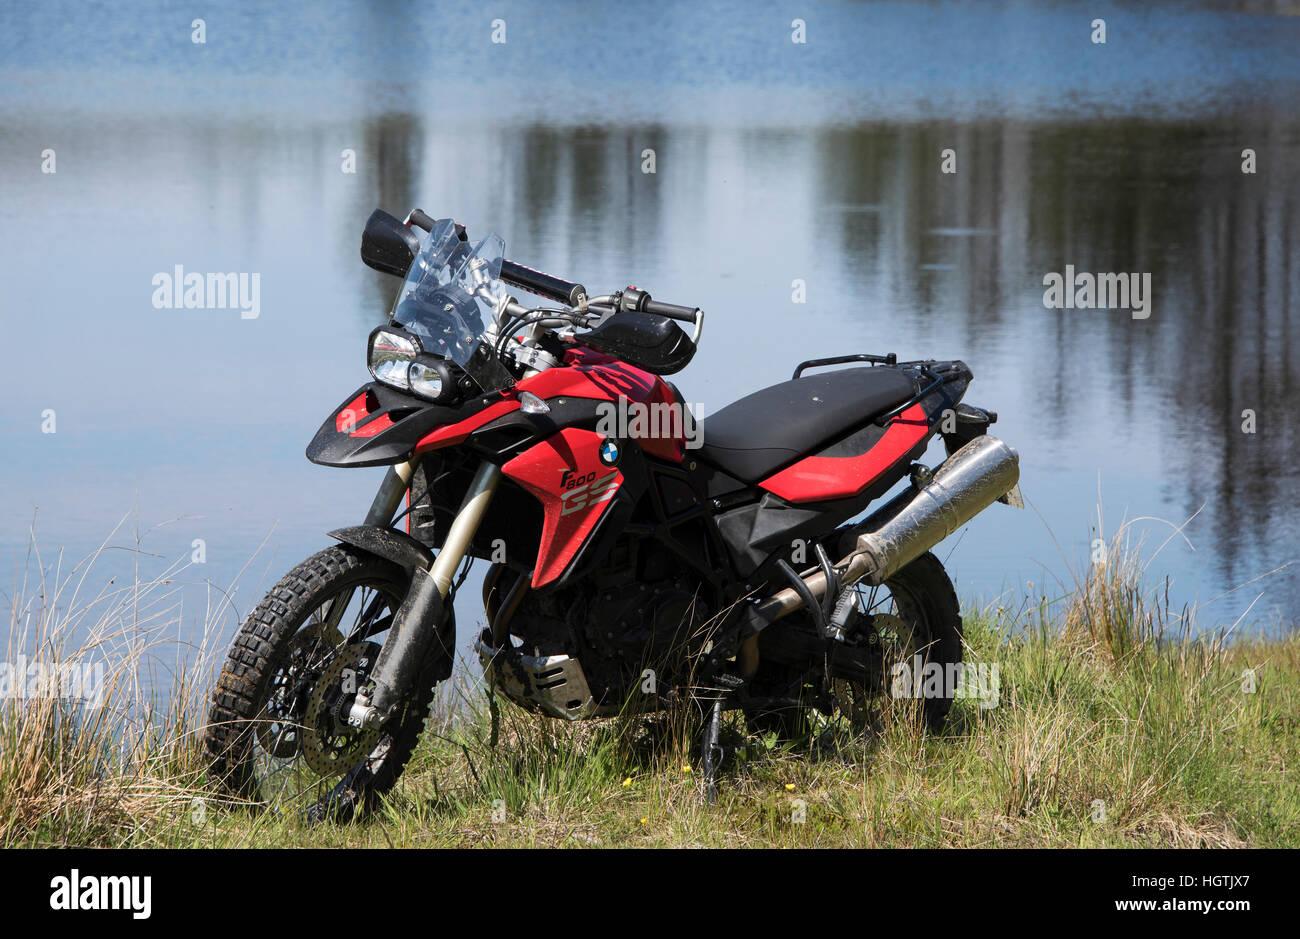 BMW  F 800 GS Adventure motorcycle parked beside lochen Shira near Inveraray, Argyll. - Stock Image